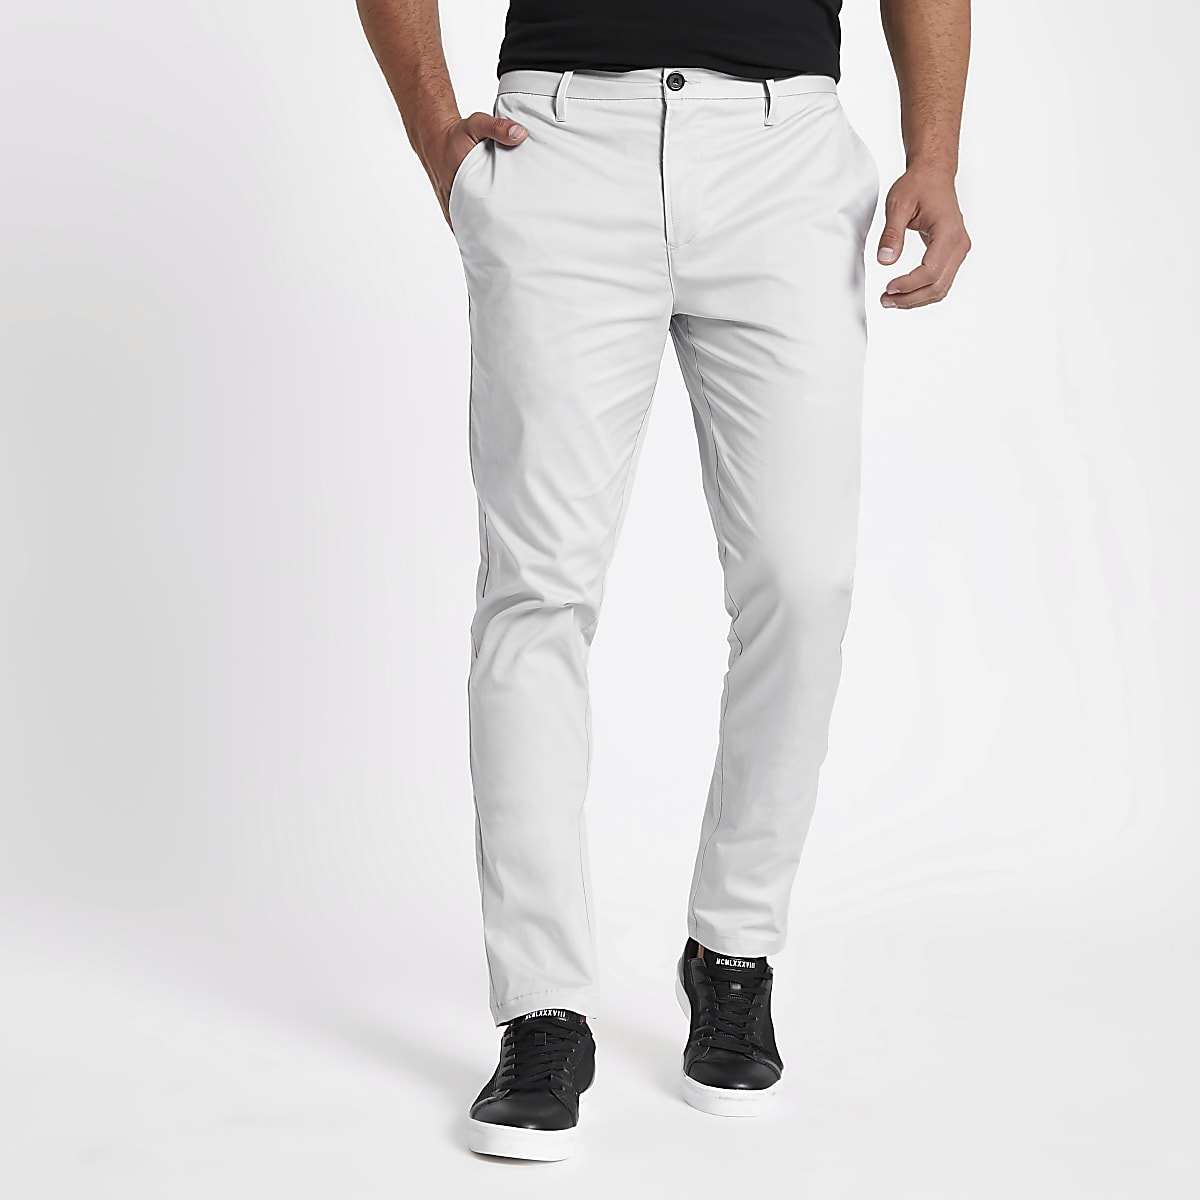 Grey slim fit chino pants